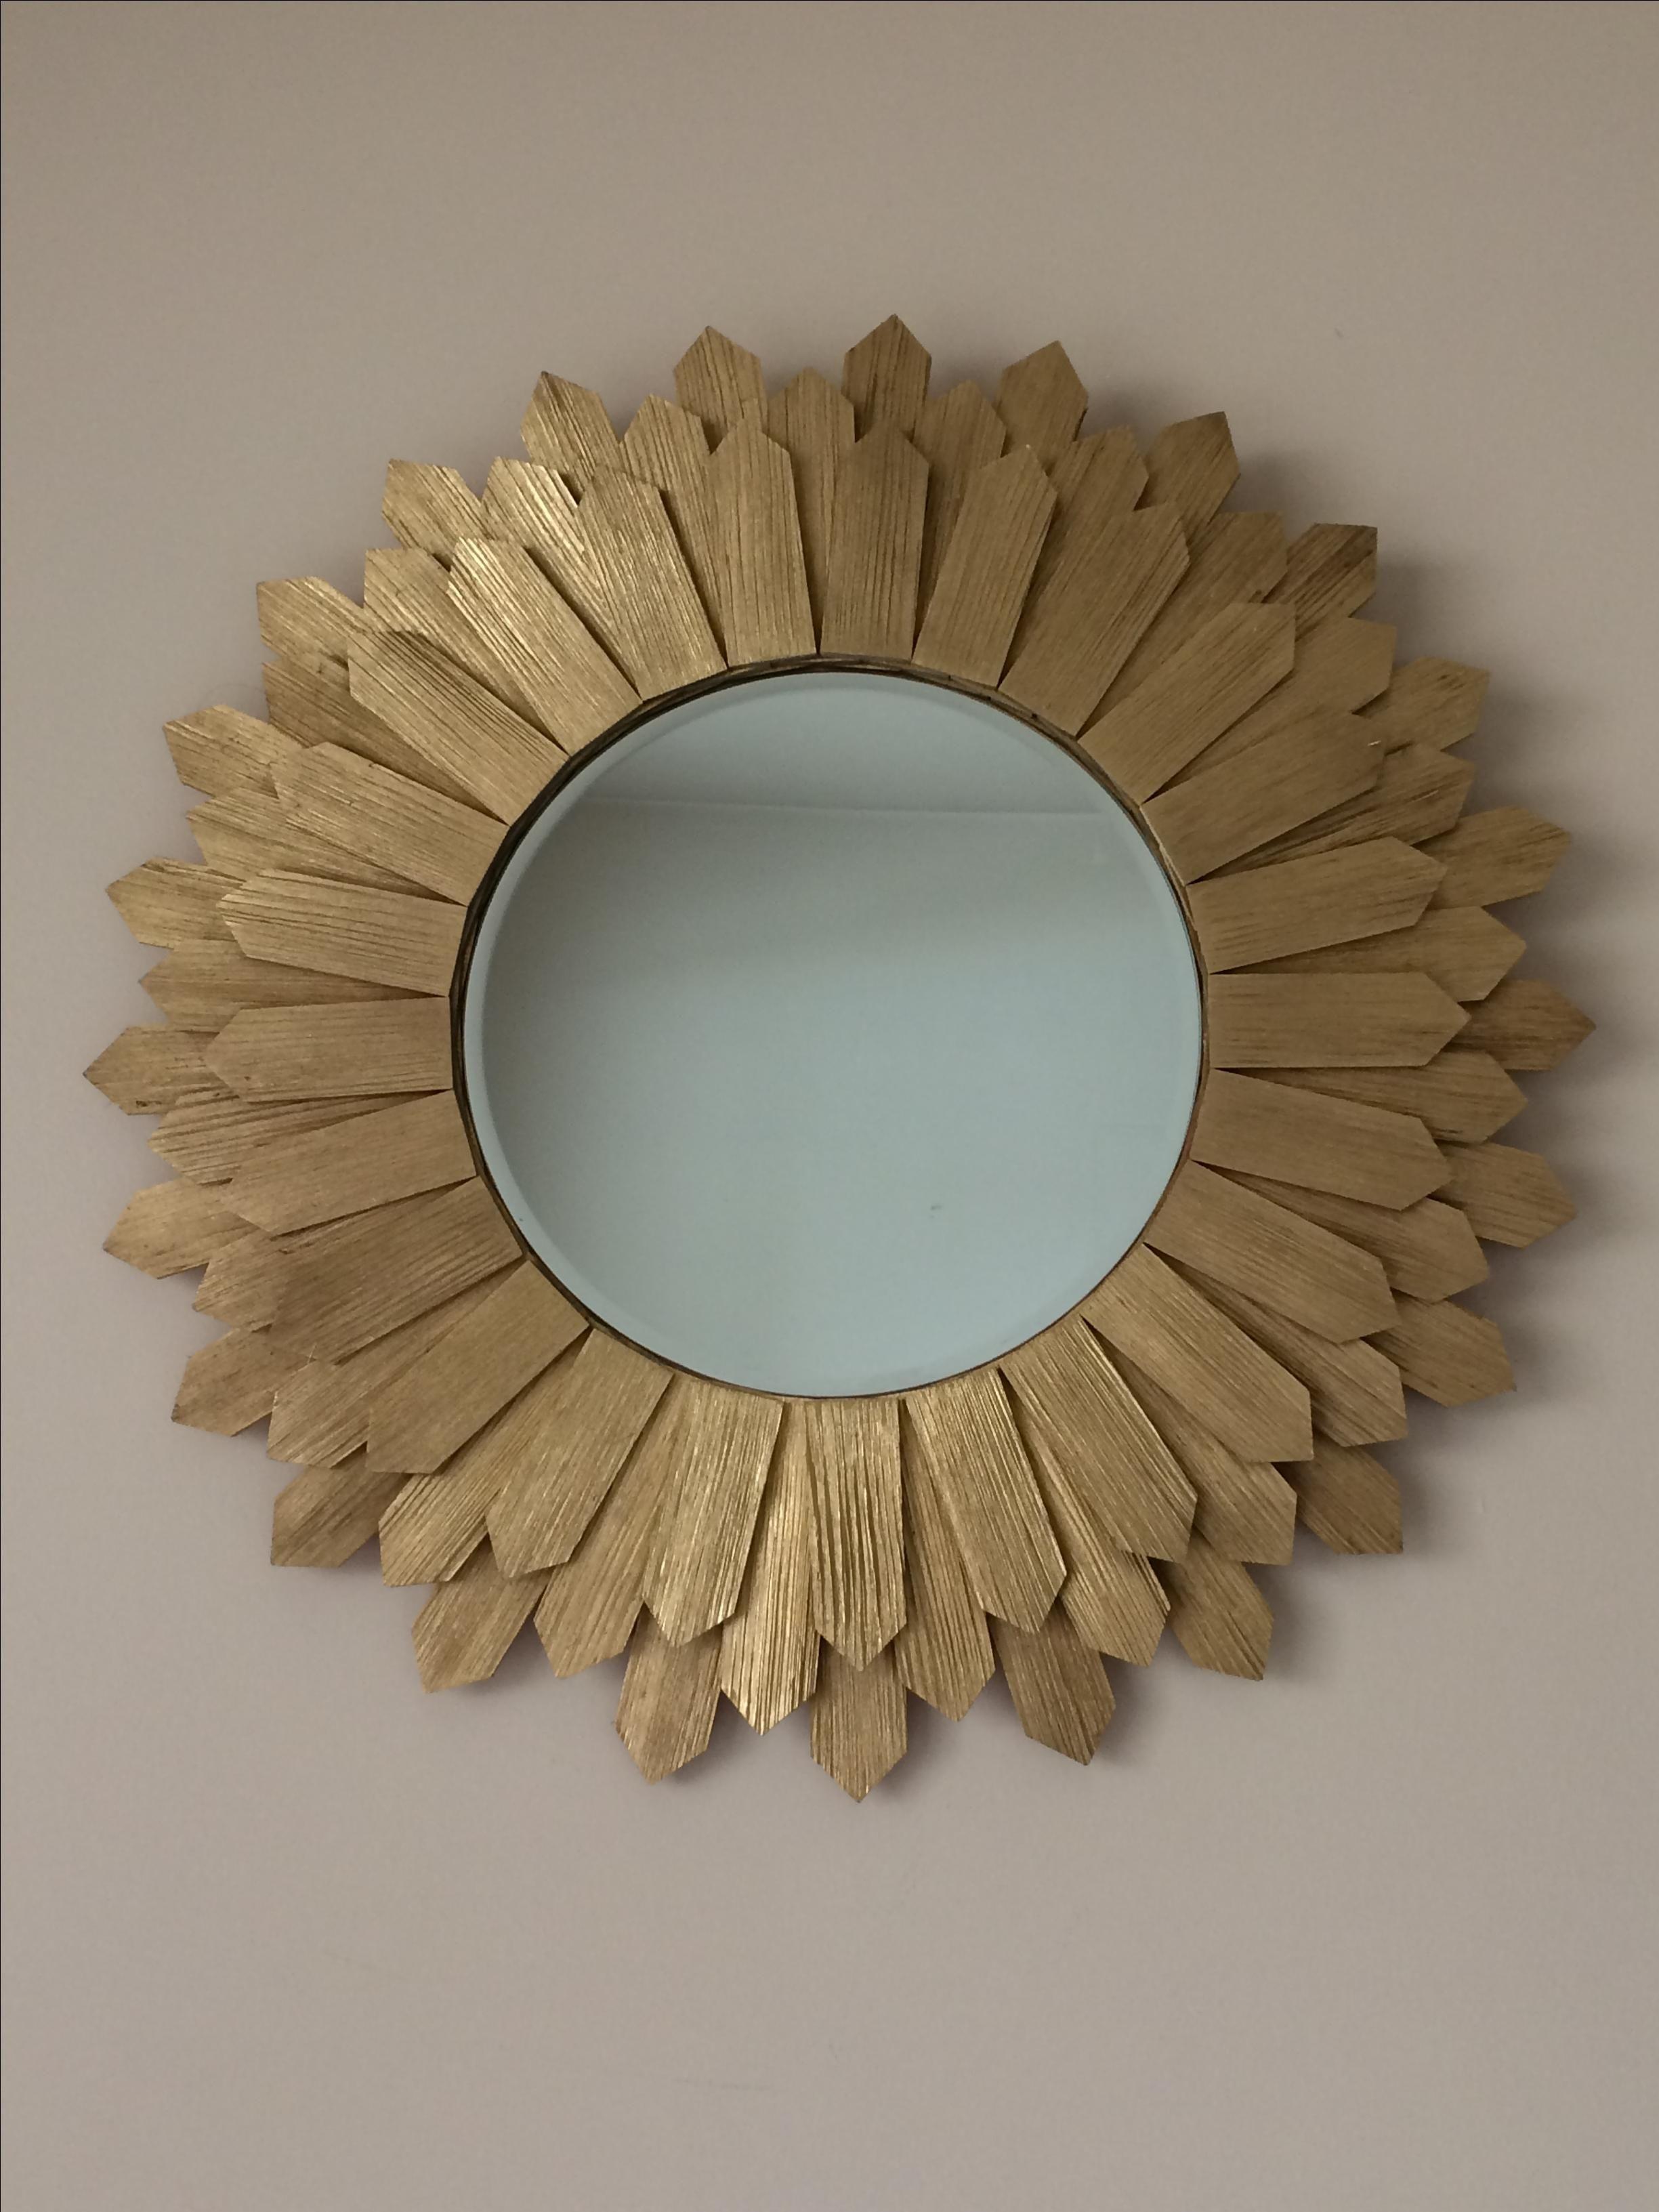 Buy A Hand Made Sunburst Wall Mirror Mid Century Modern 24